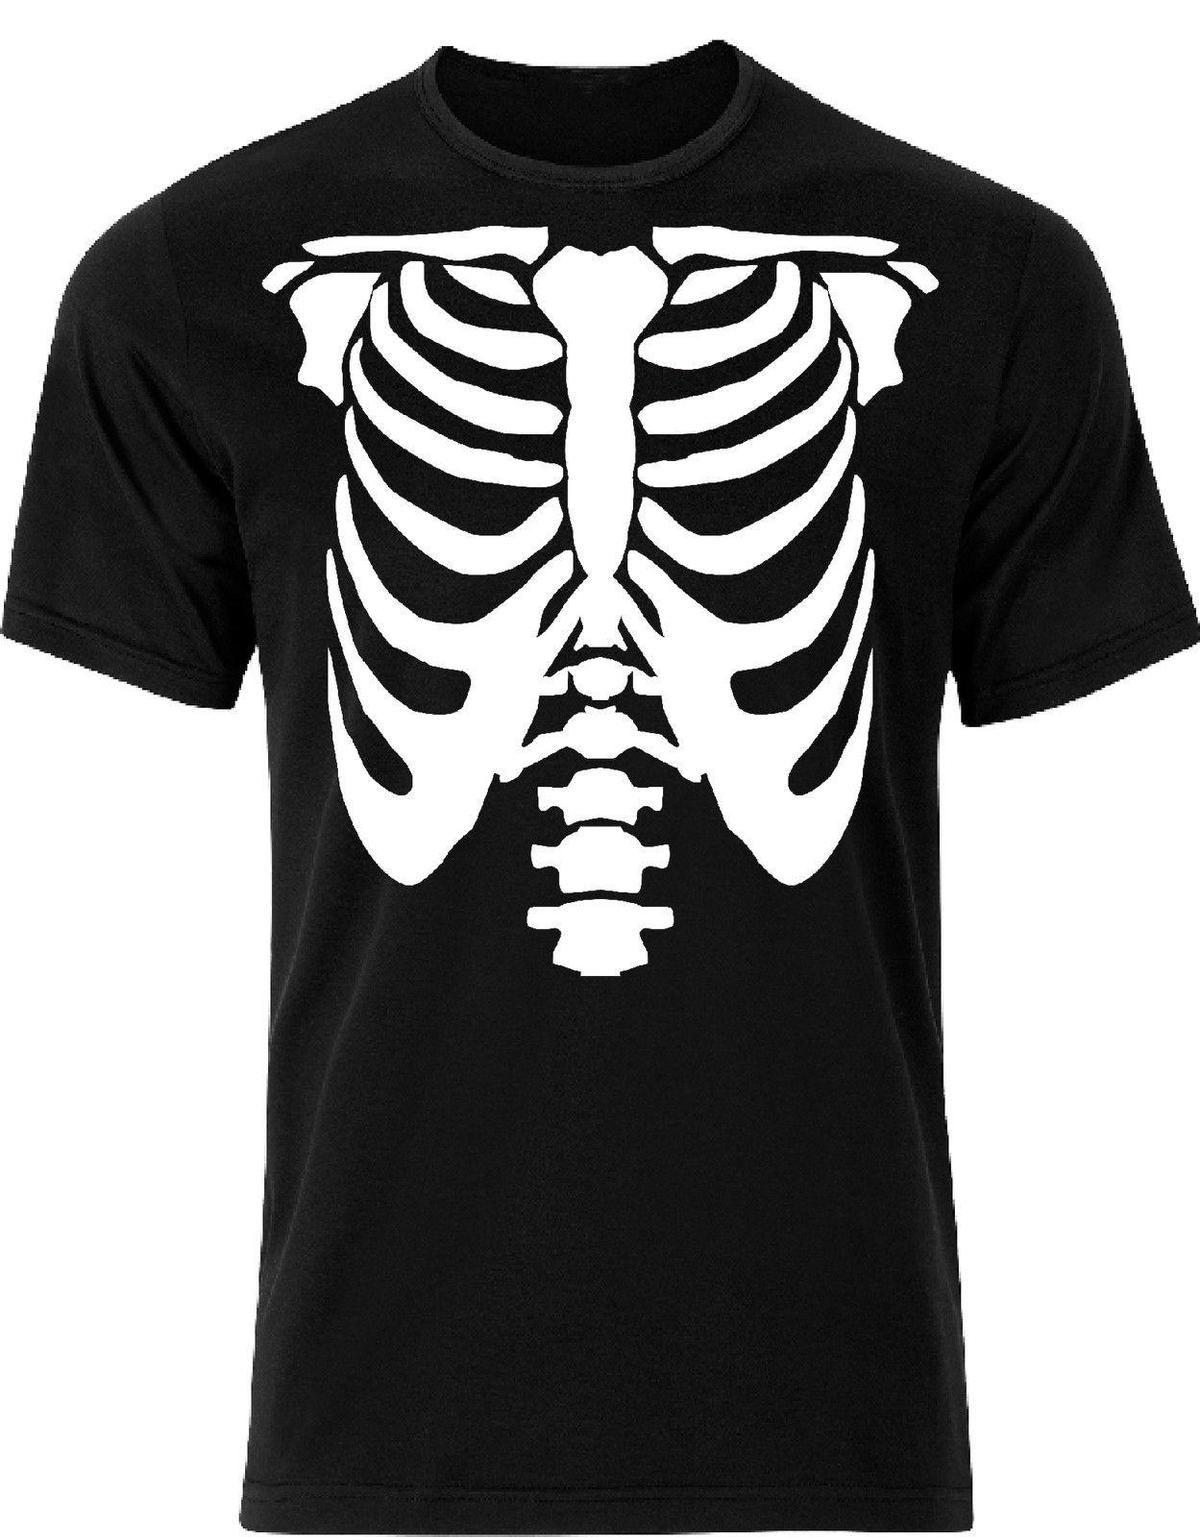 72fa4117 Skeleton T Shirts Jumpers Halloween Black White Ribs Happy Halloween AI23  Mens 2018 Fashion Brand T Shirt O Neck 100%cotton Cool Tee Shirt Designs  Buy Cool ...